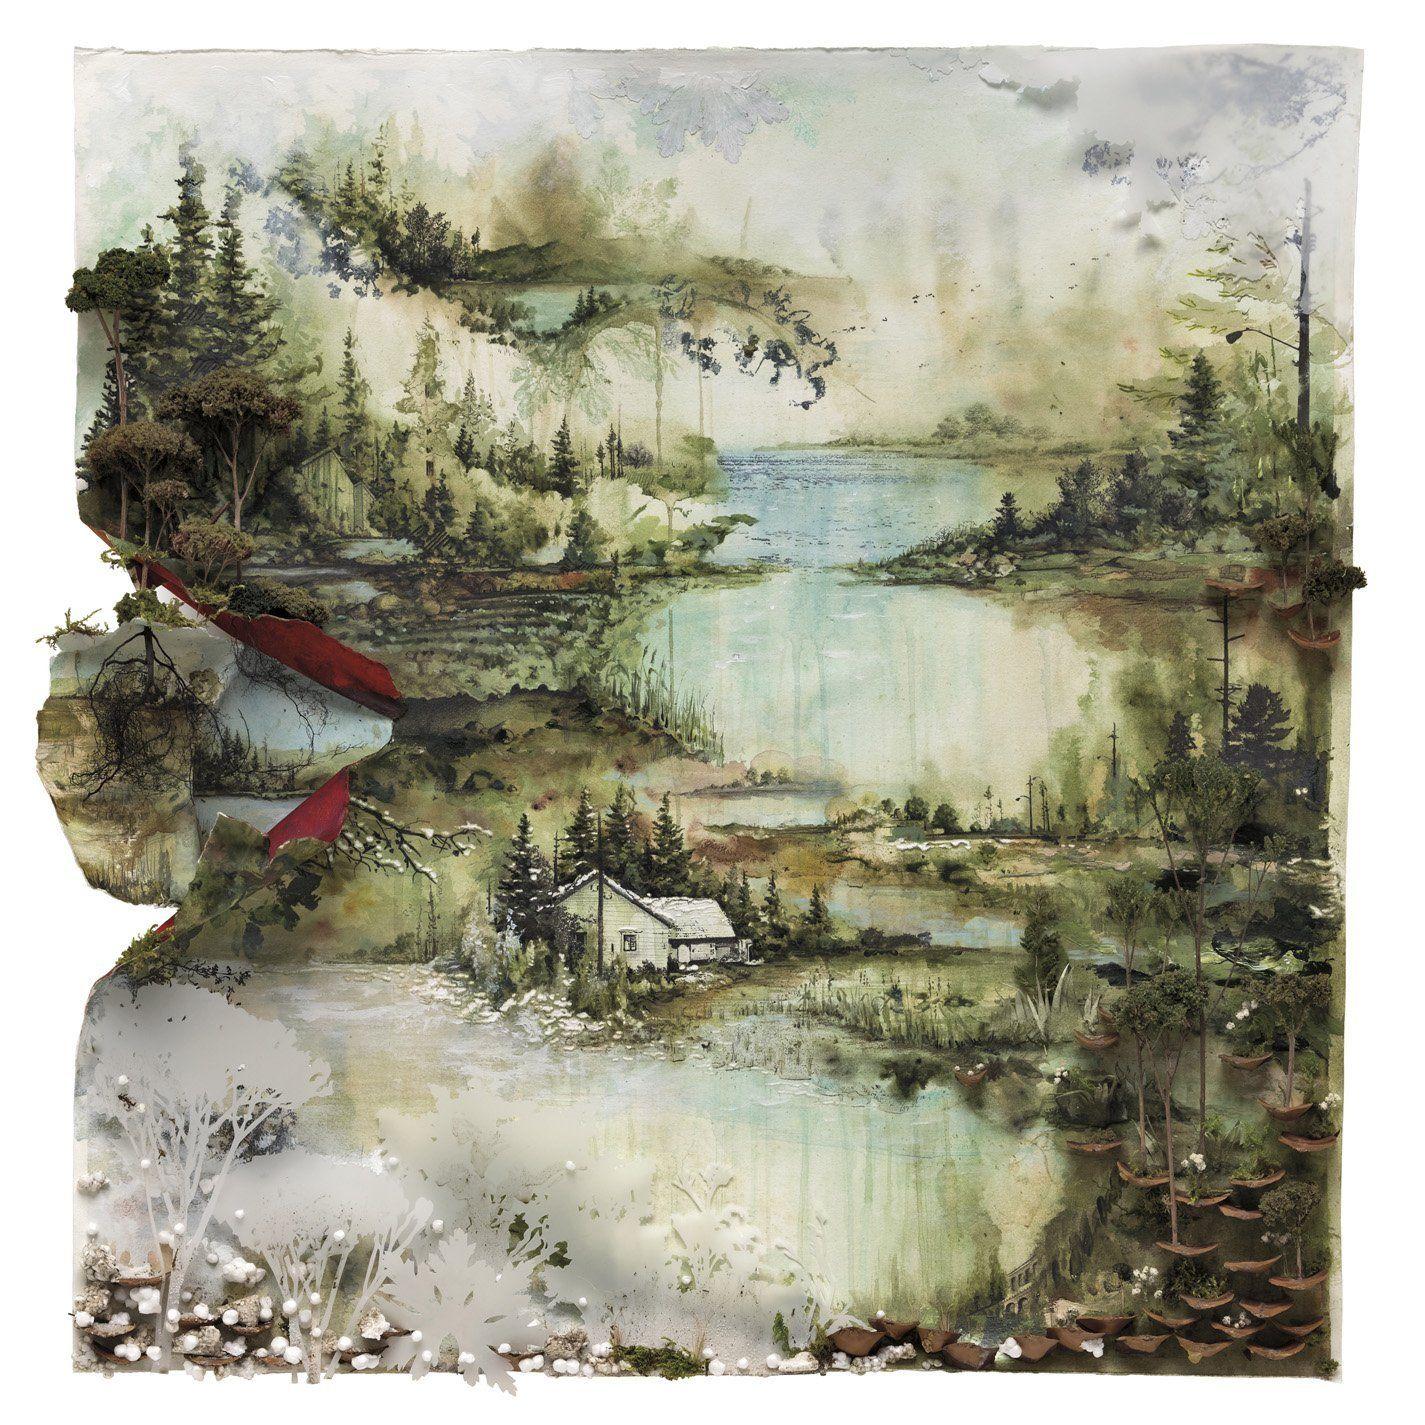 Bon Iver - Bon Iver album cover